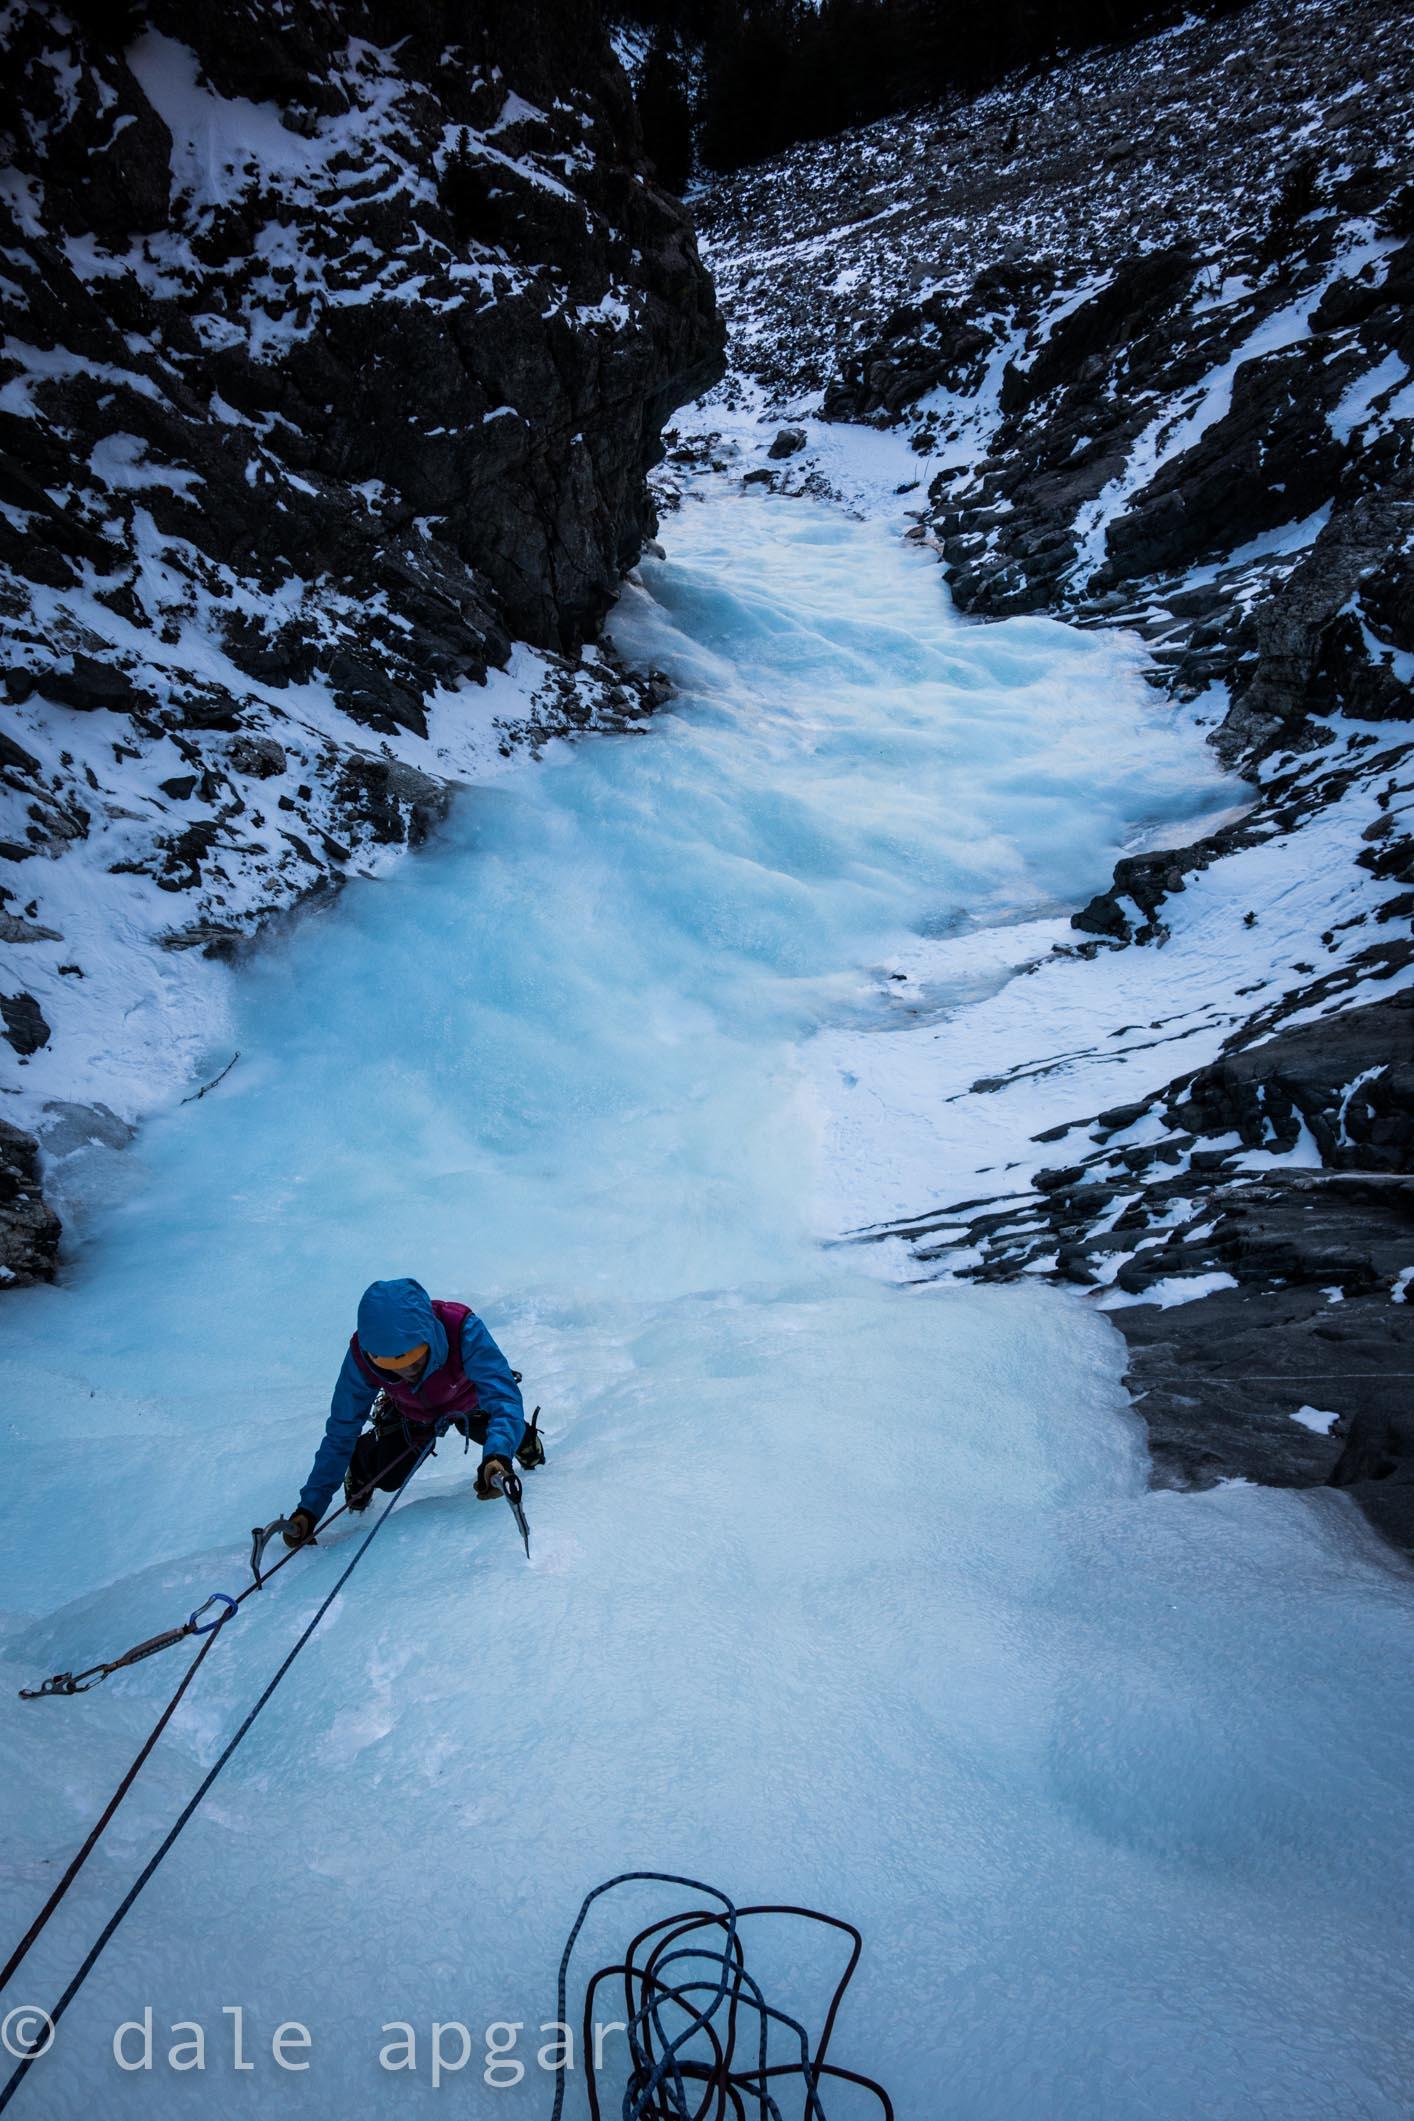 Lauren Smith exploring the backcountry ice flows on Montana's Beartooth Pass